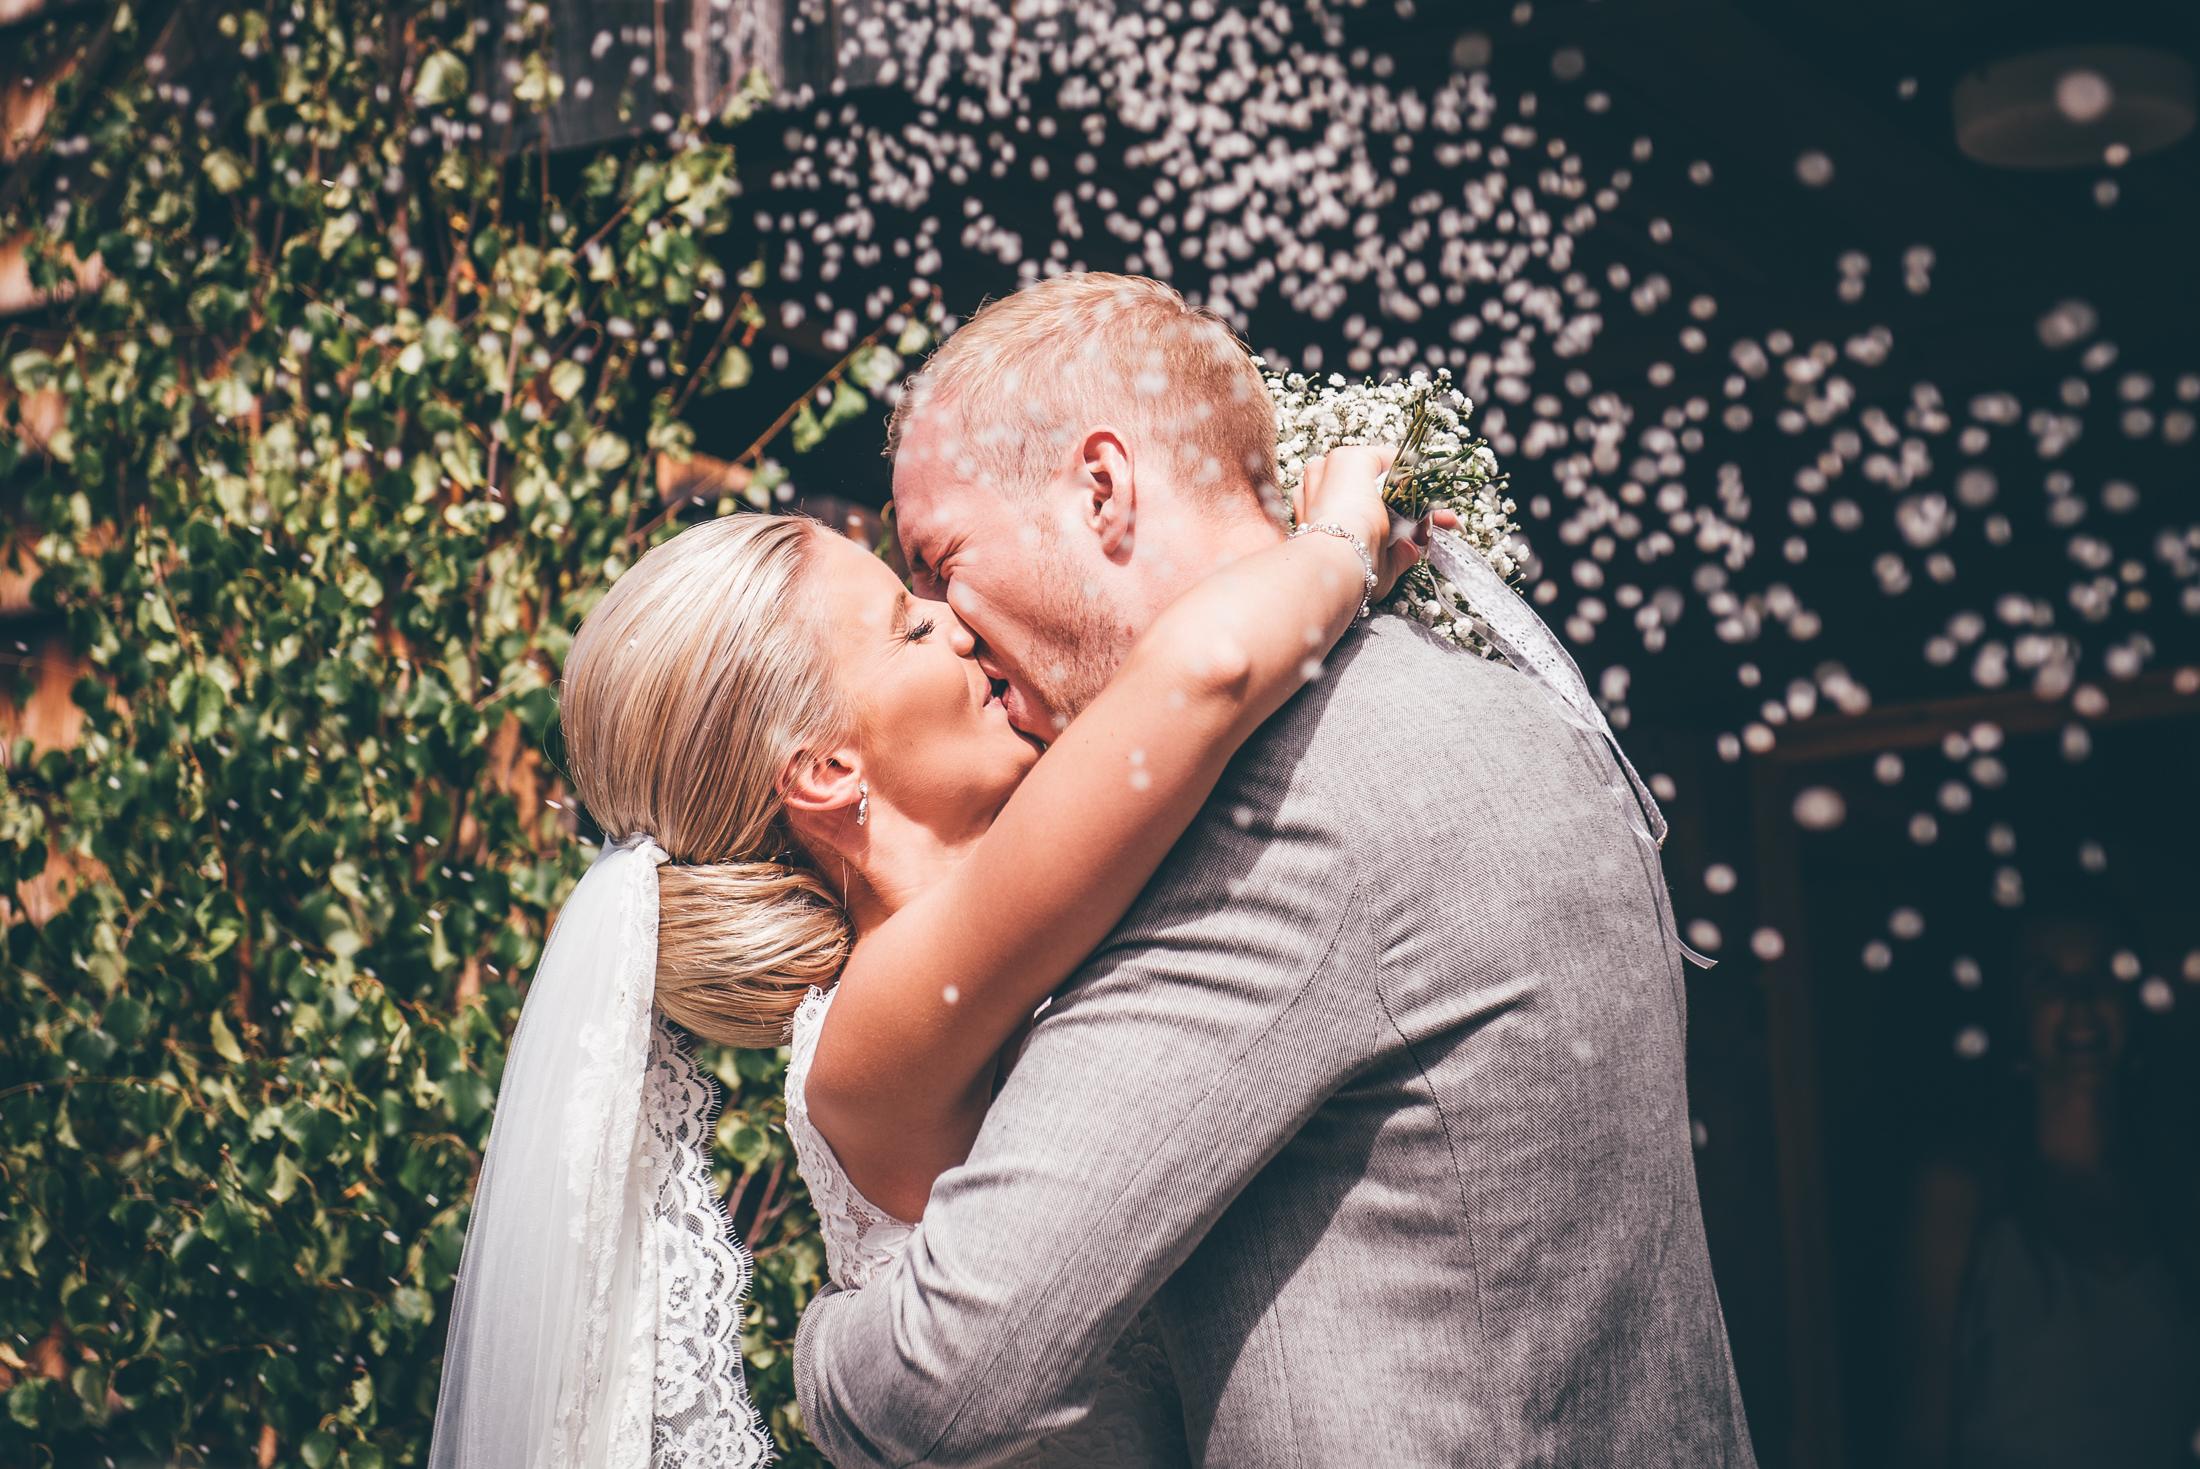 bröllop_linda_robin05.jpg